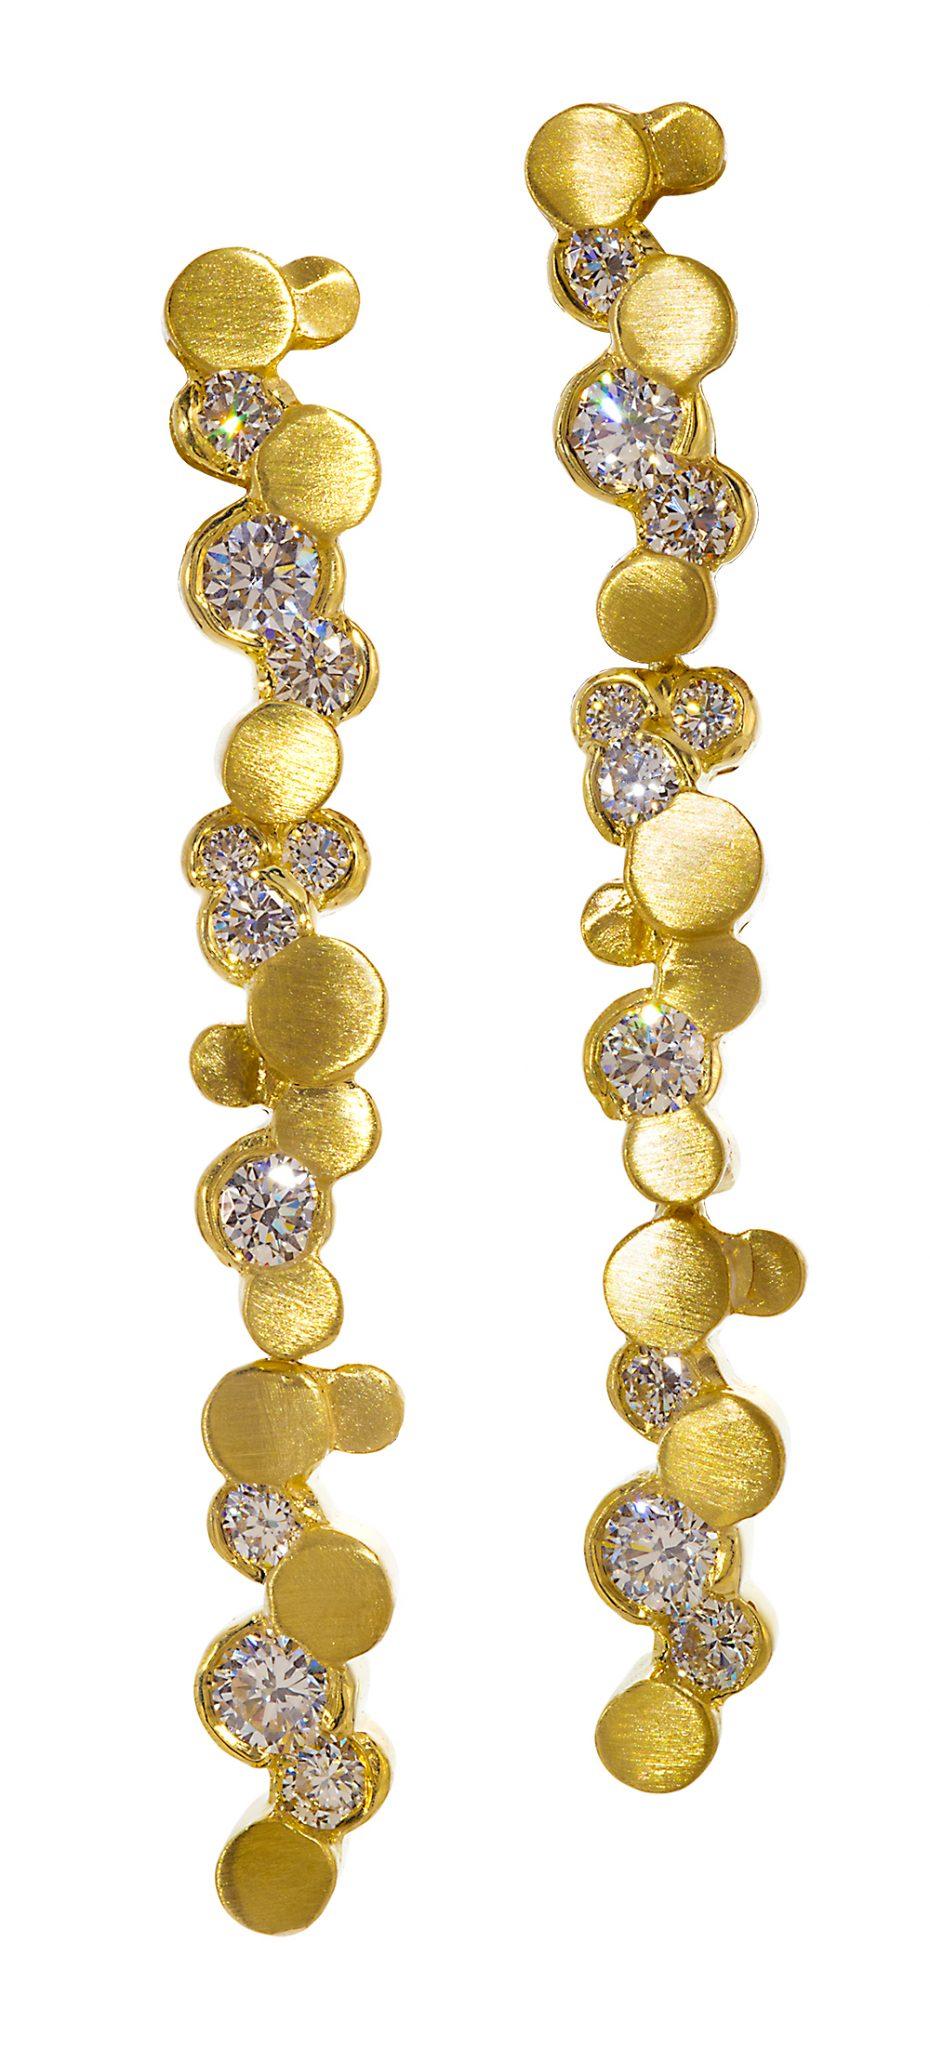 Fashion dangle earrings in gold with diamonds